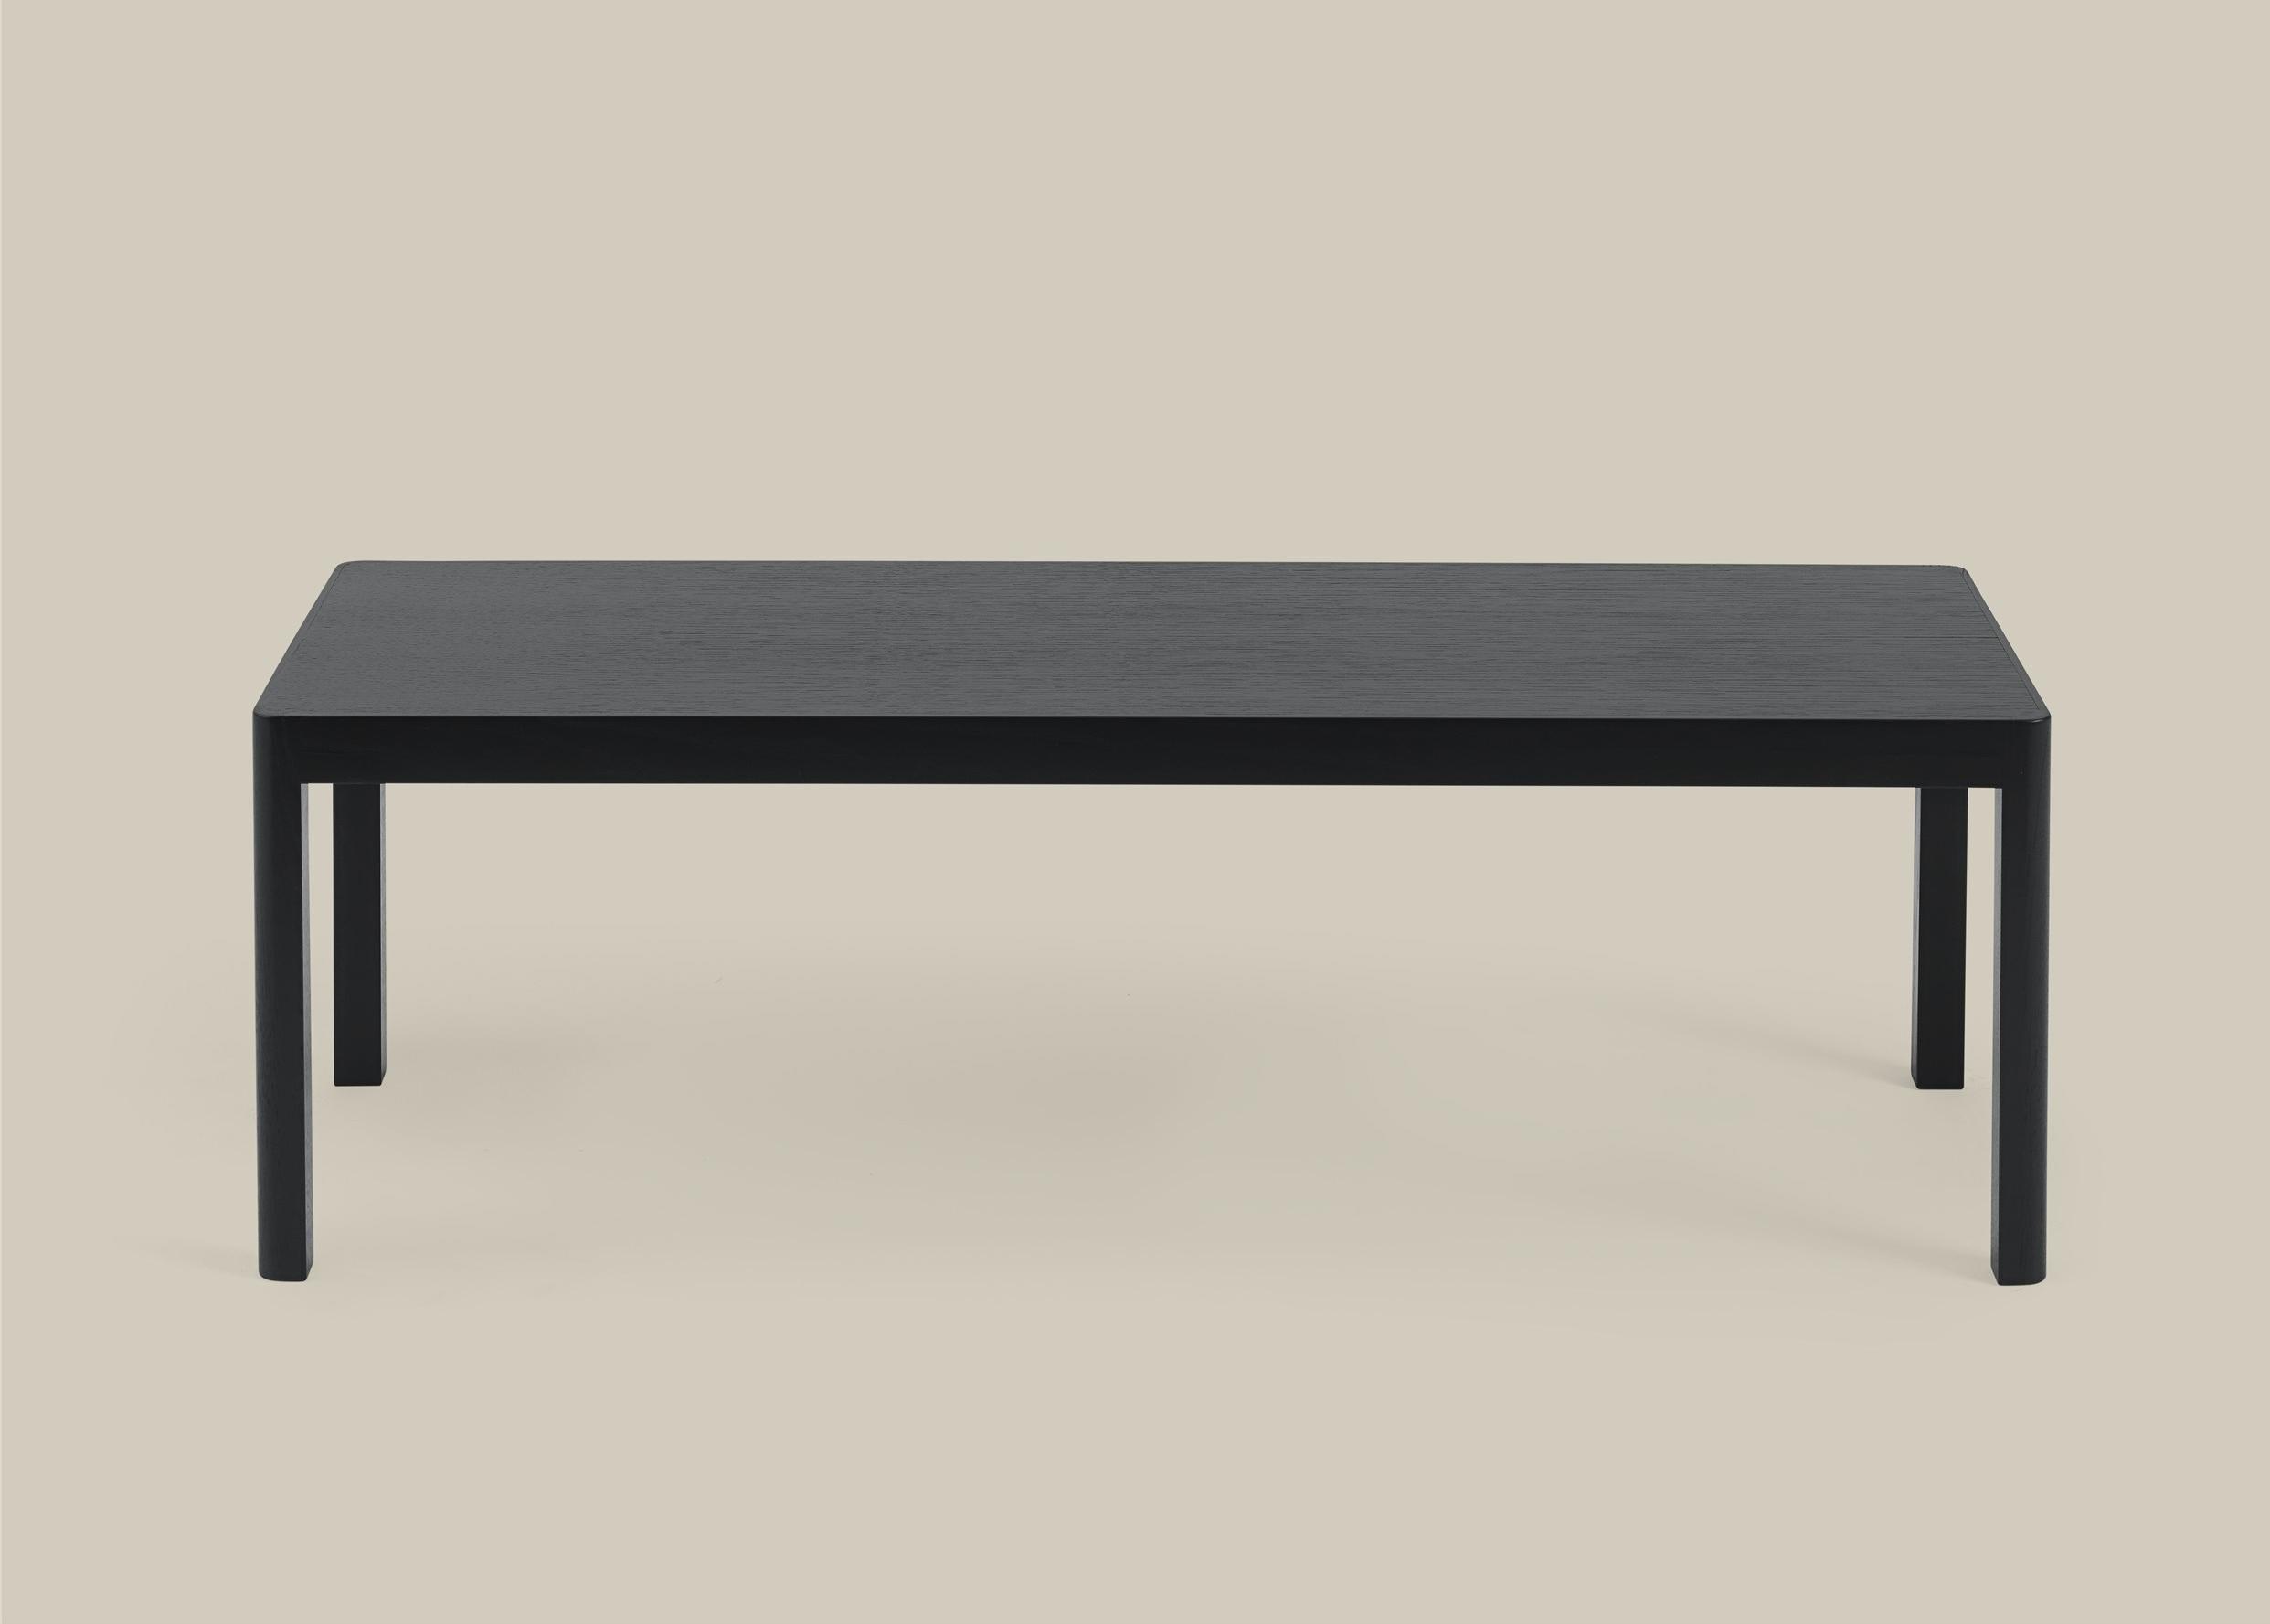 Workshop-coffee-table-black-front-CB-Muuto-5000x5000-hi-res_(150).jpg